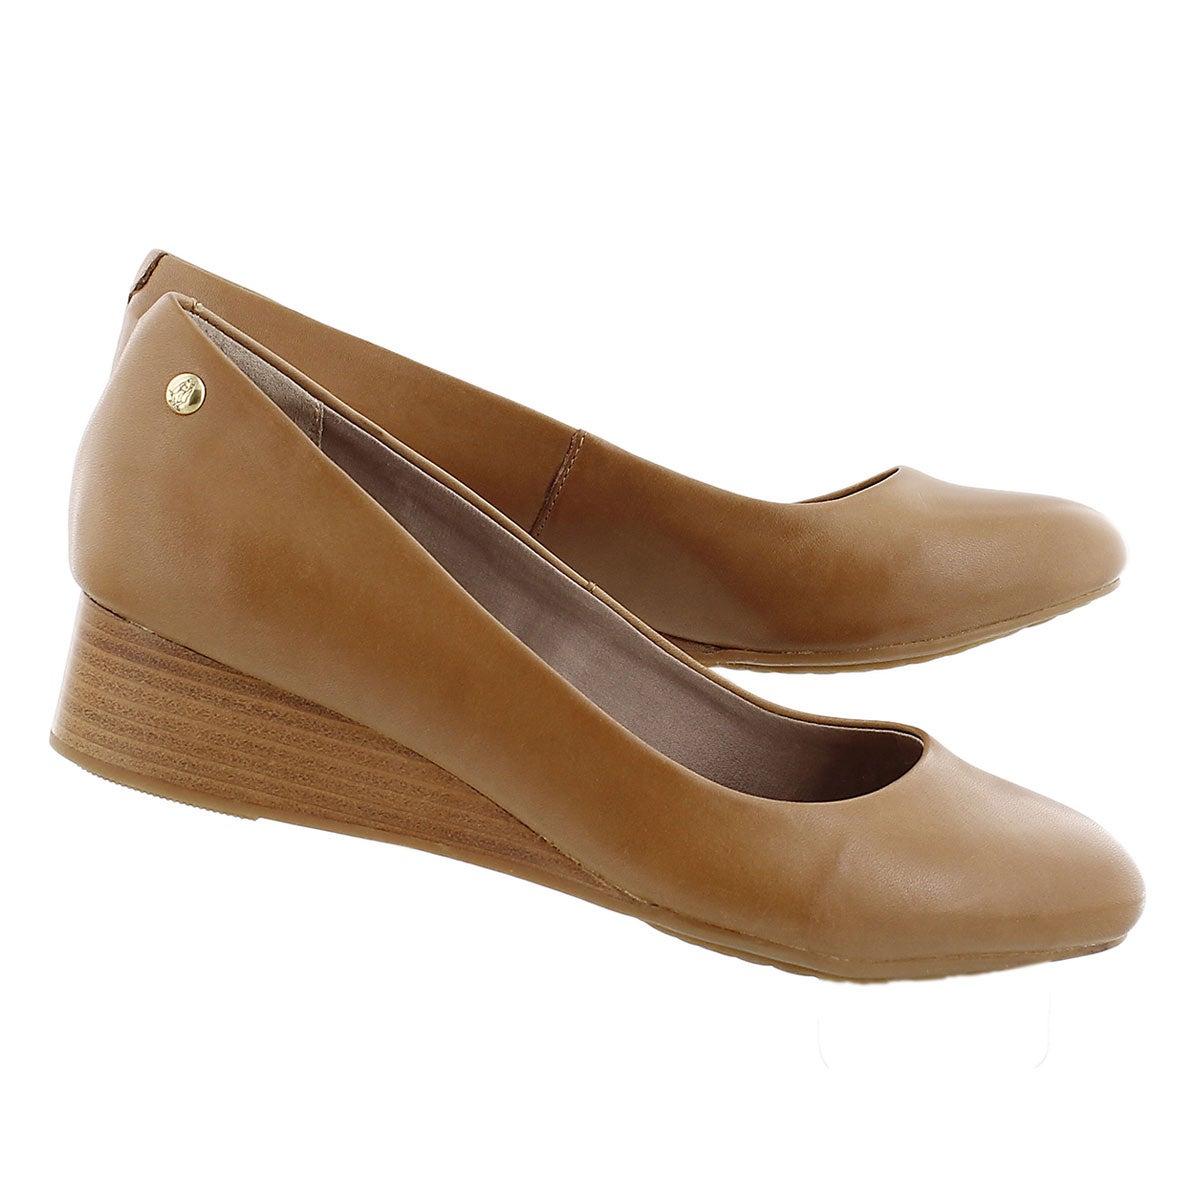 Chaussure à tal comp Admire, havane, fem